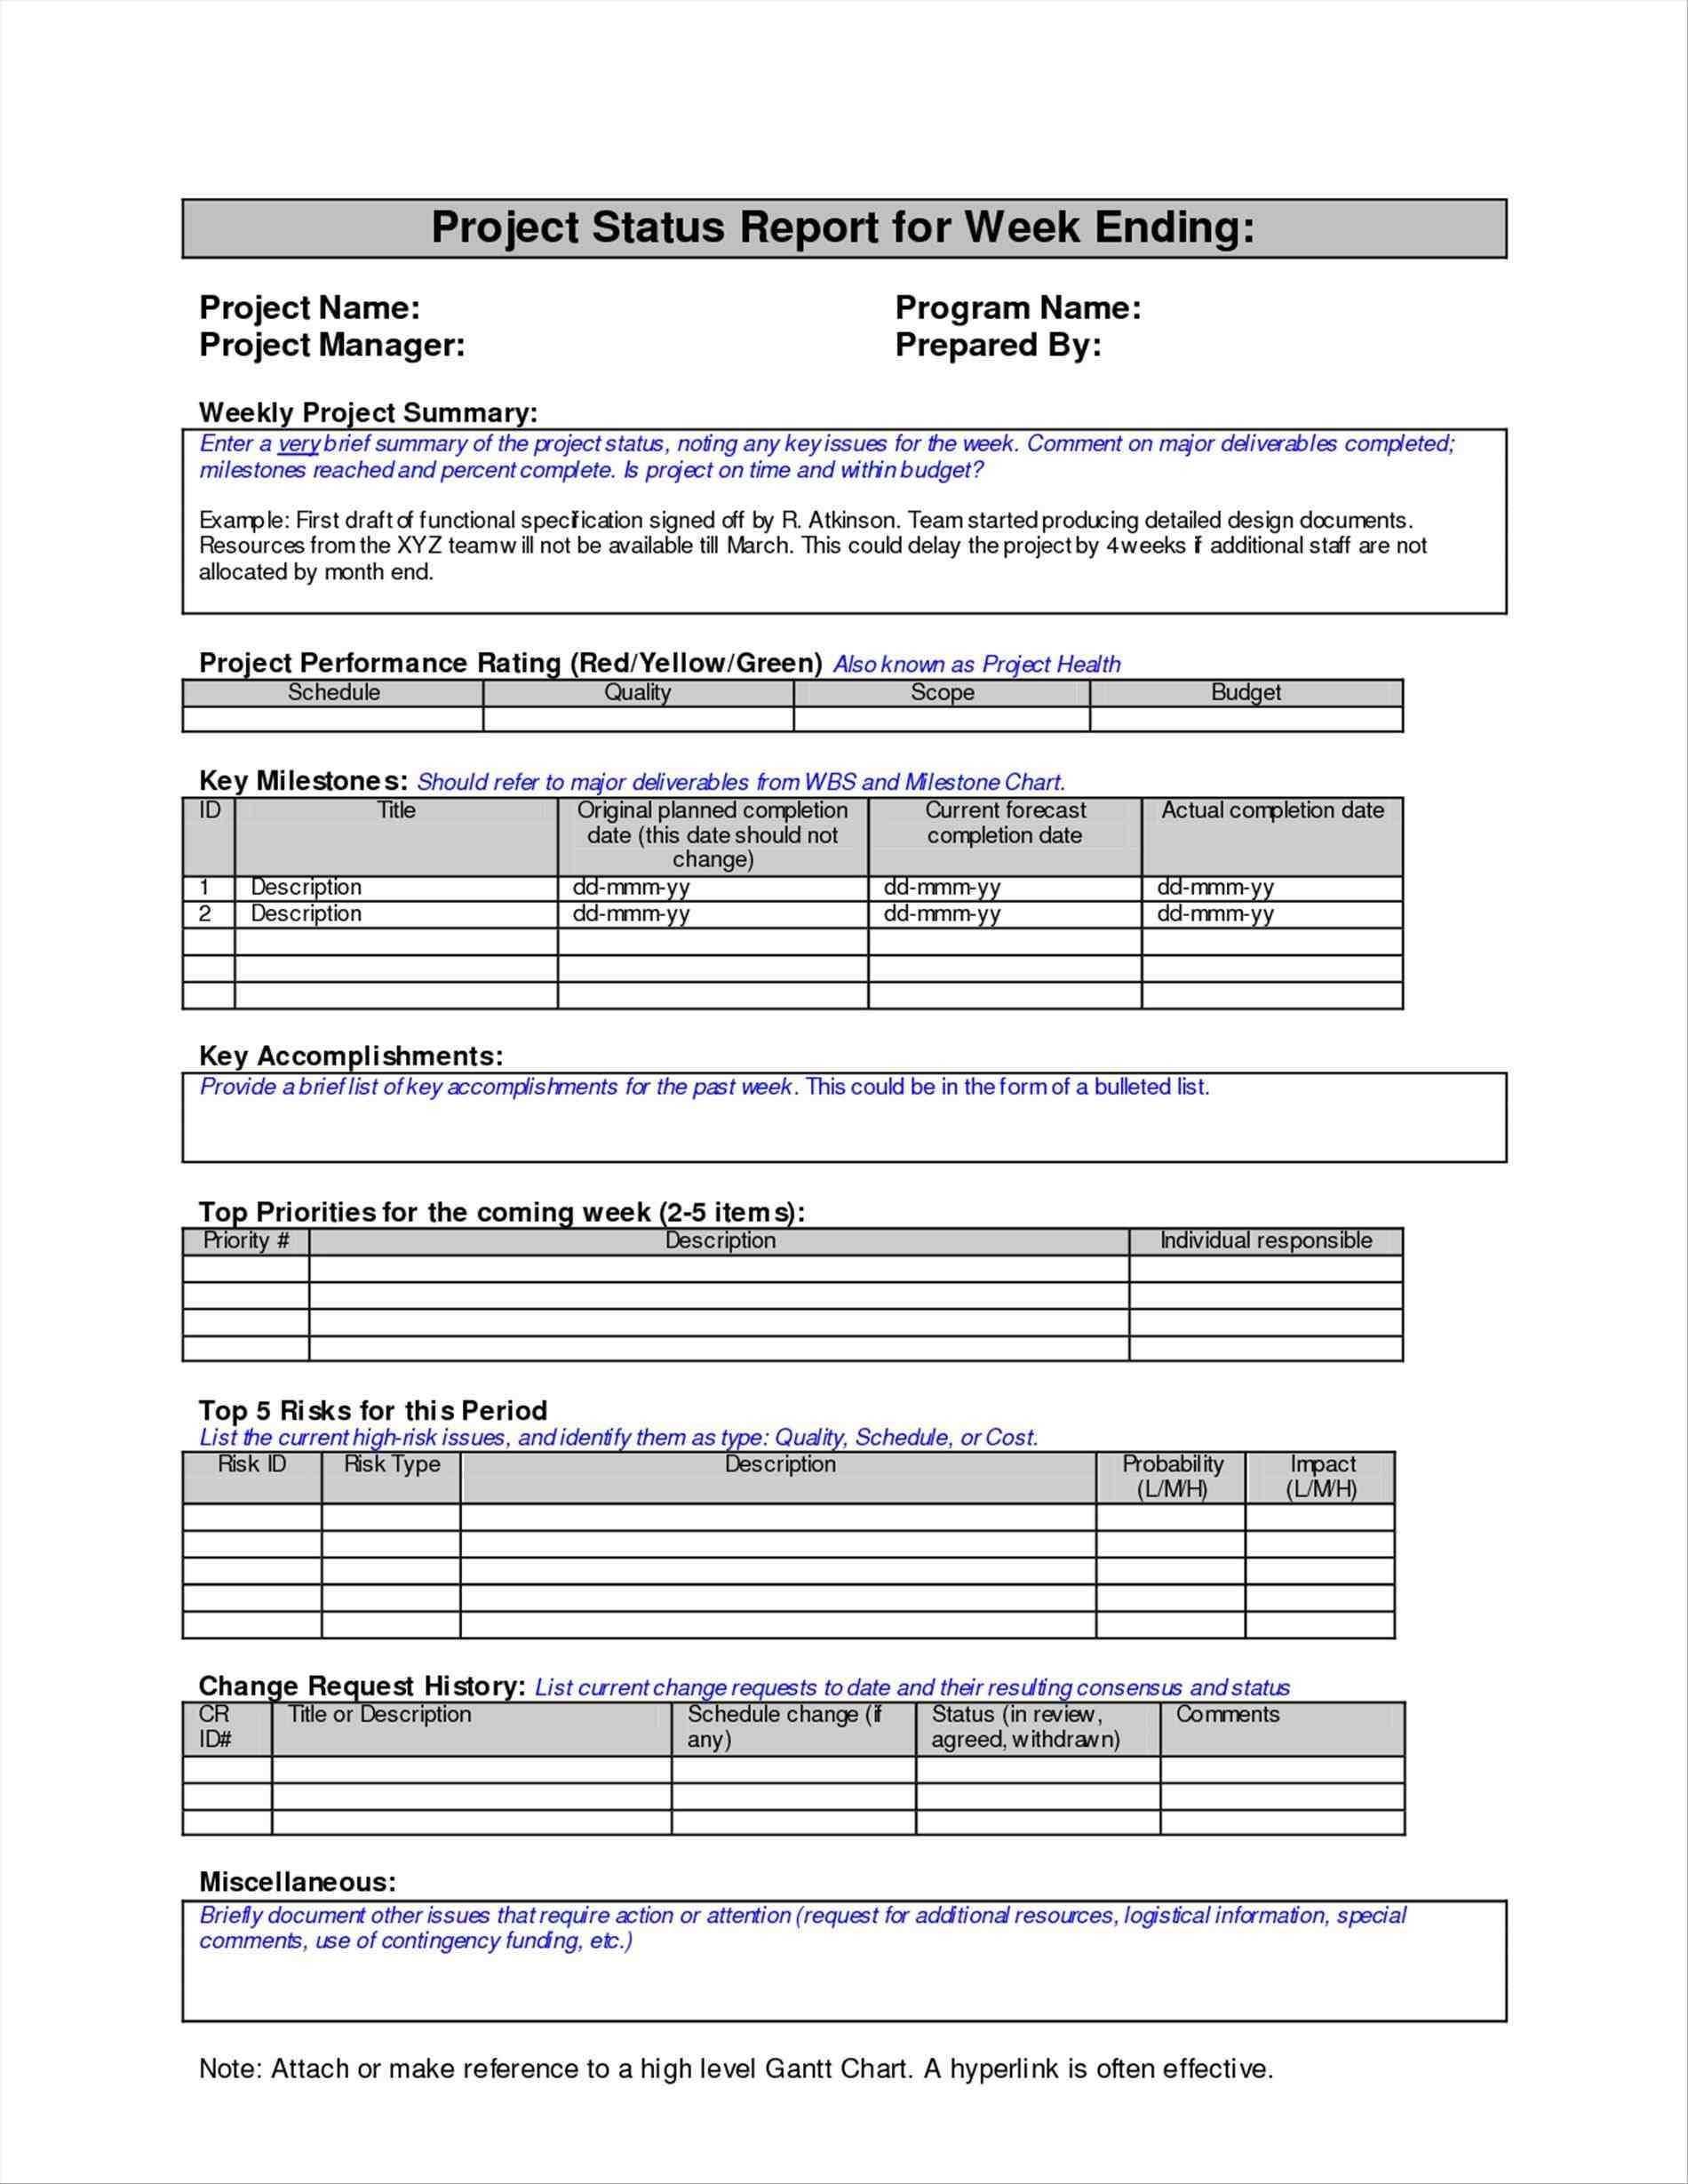 New Post Interior Design Project Timeline Visit Bobayule In Site Progress Report Template